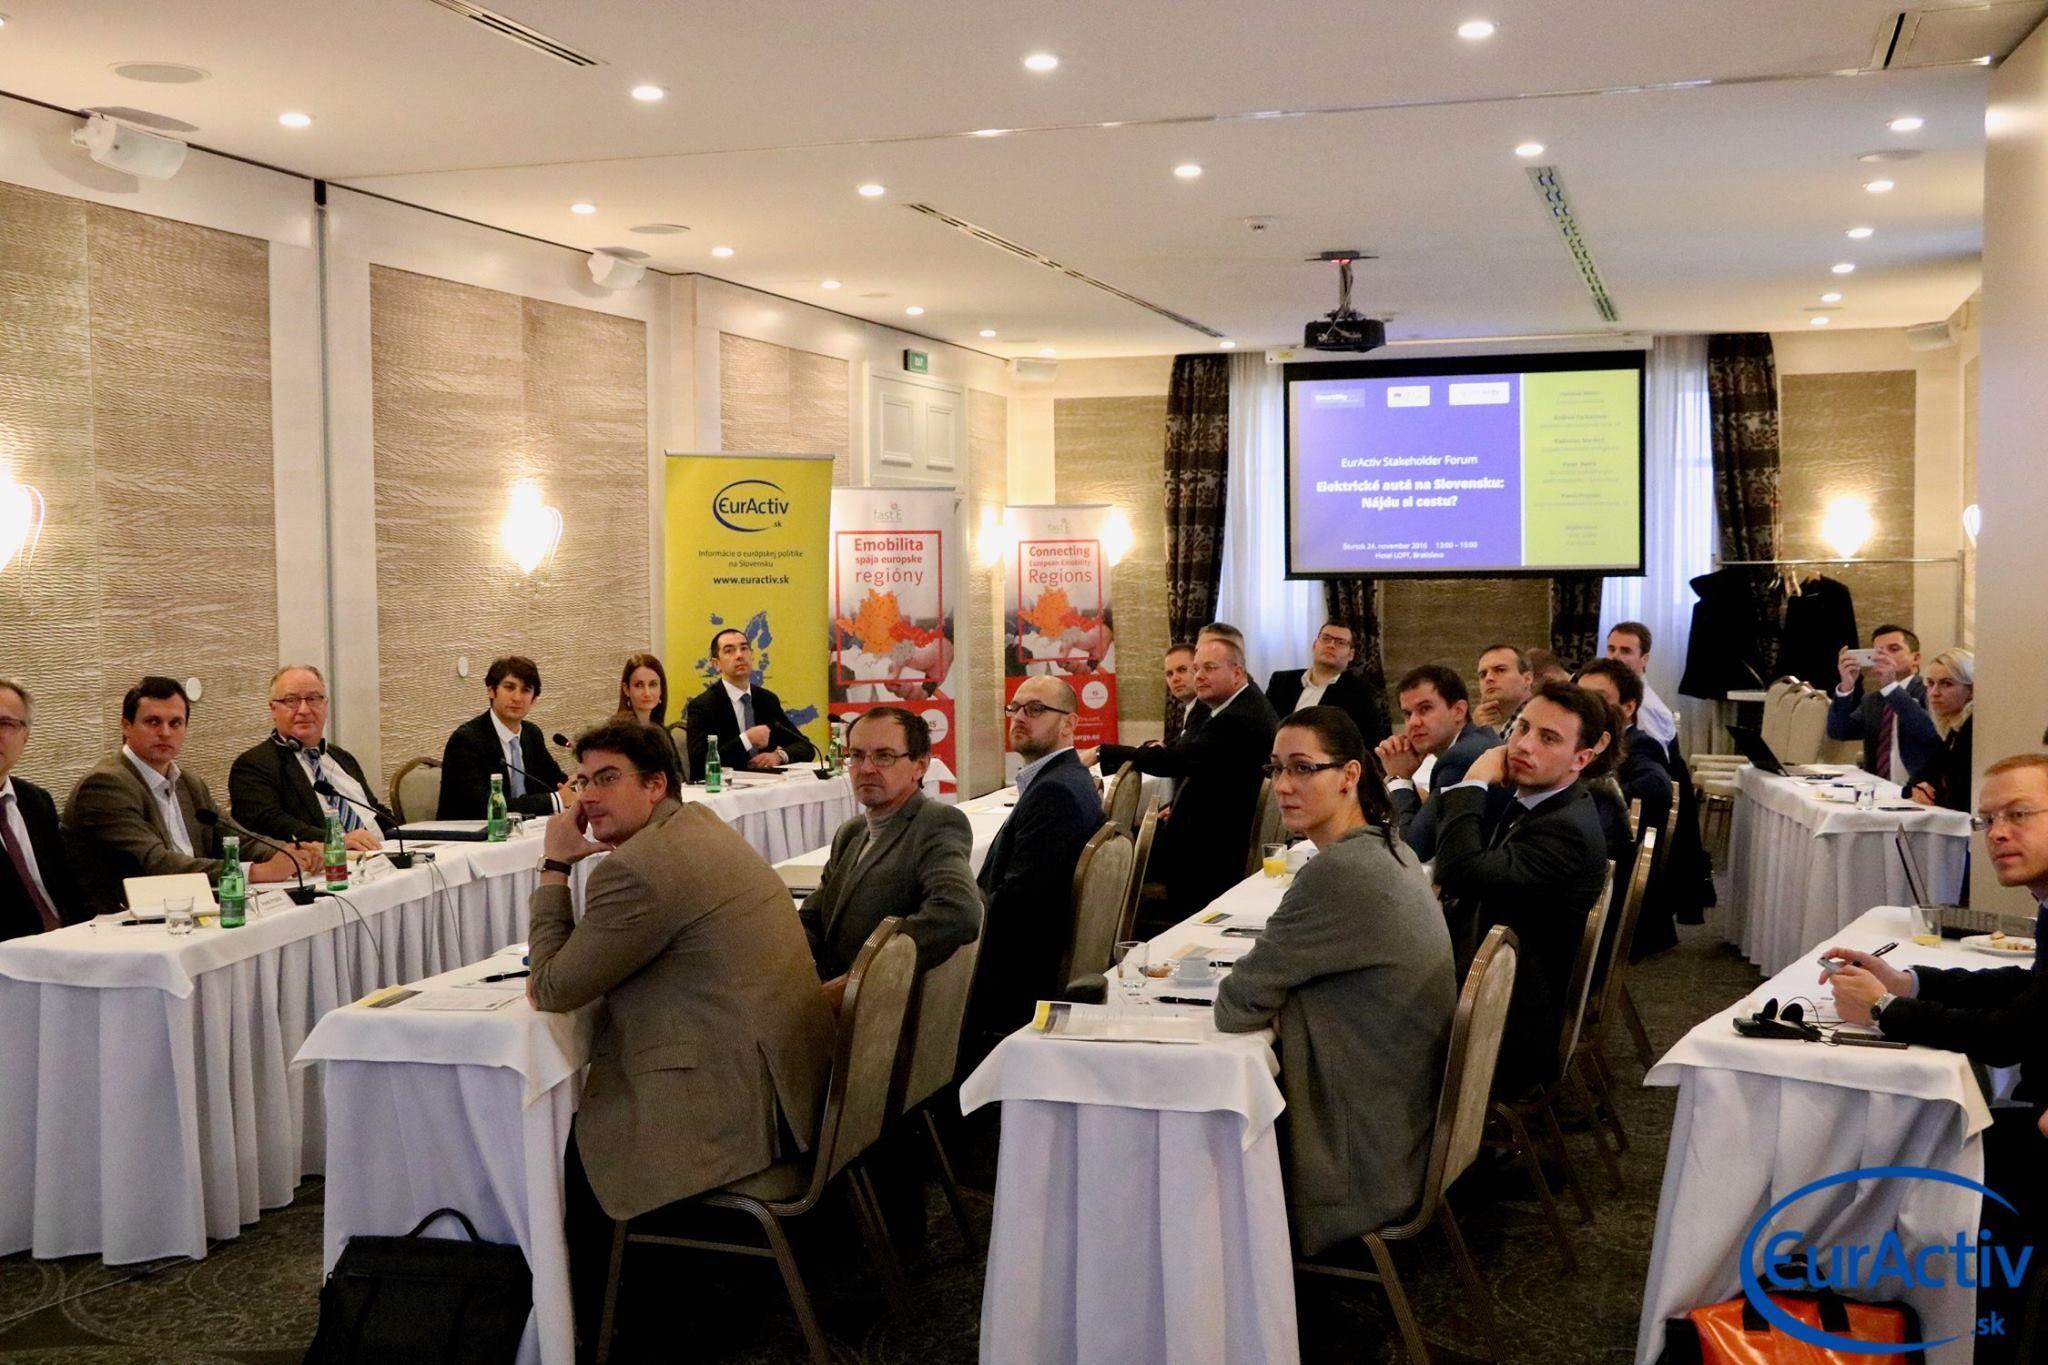 EurActiv Stakeholder Forum